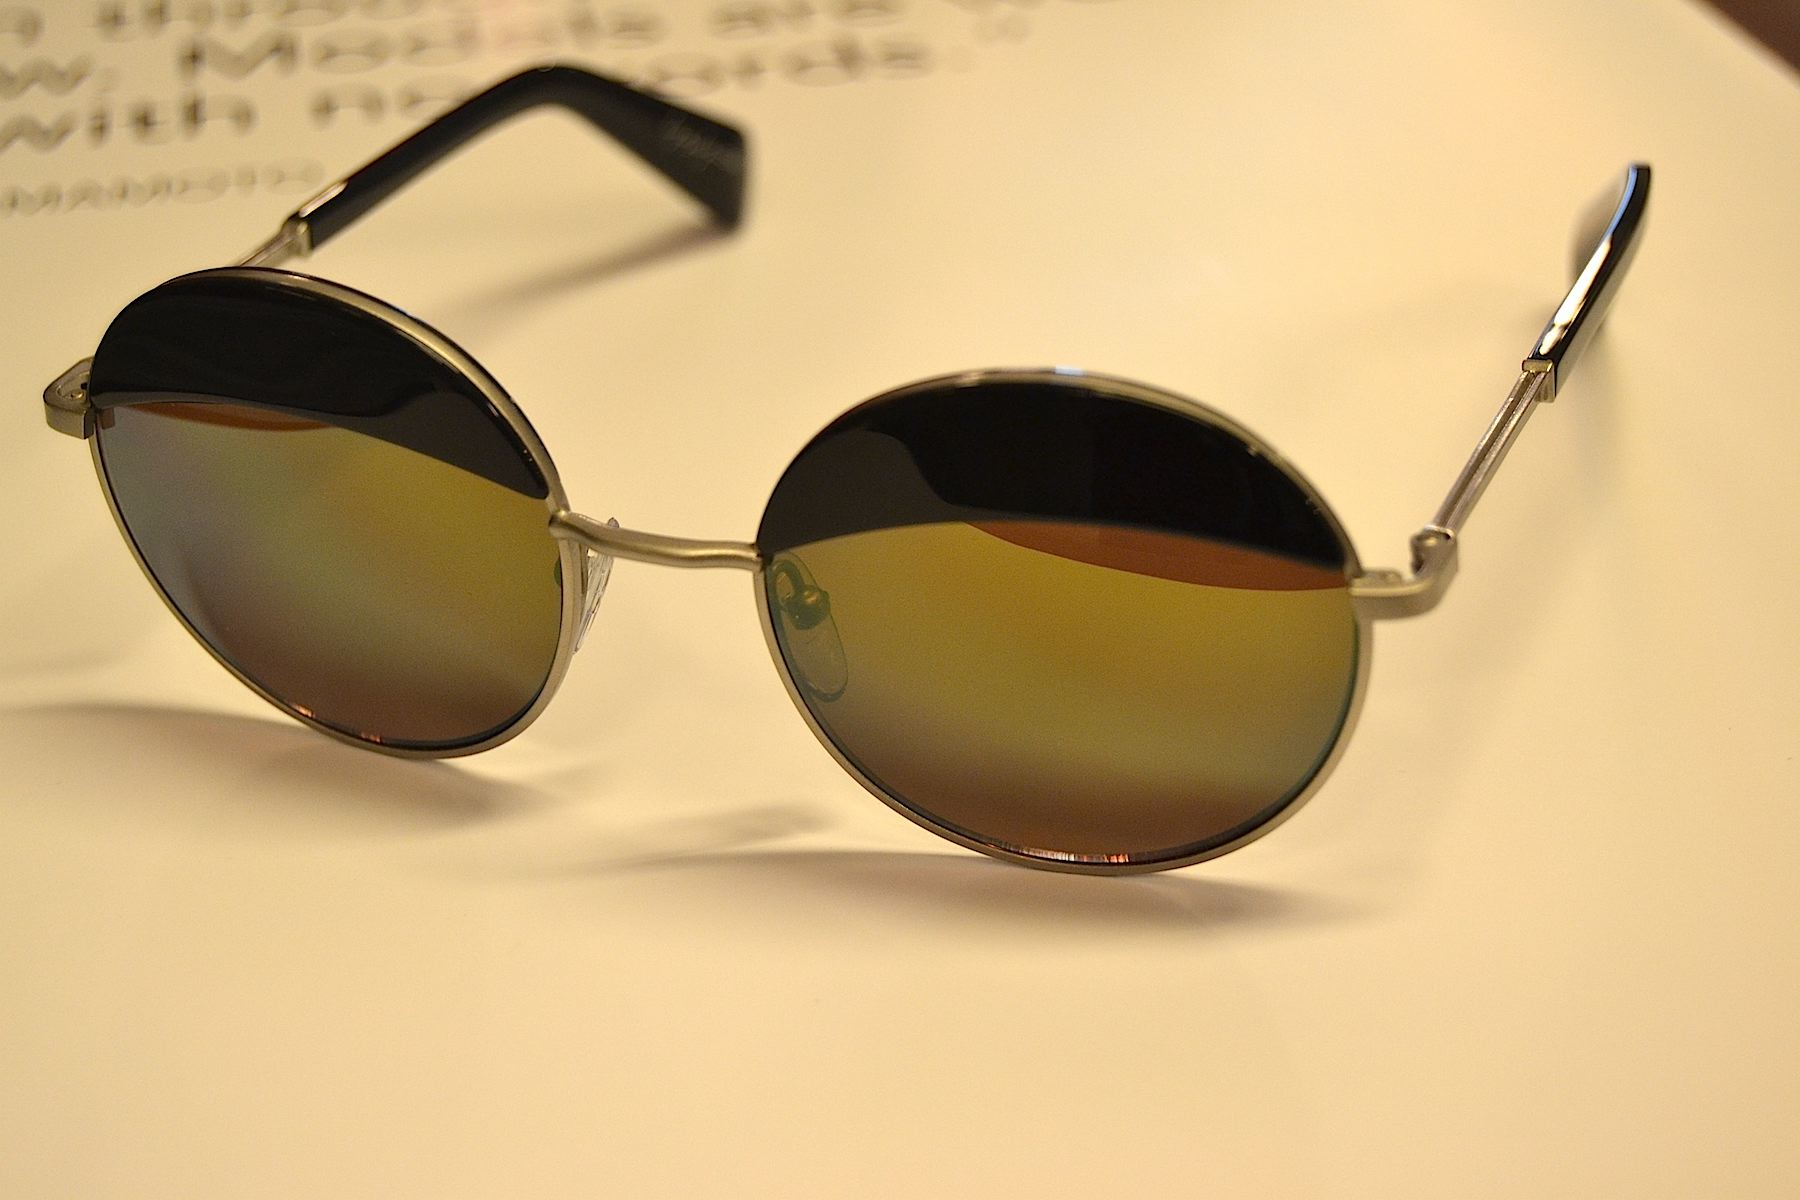 lenastore-bergamo-lenafashion-shop-online-yohji-yamamoto-gli-occhiali-sunglasses-9